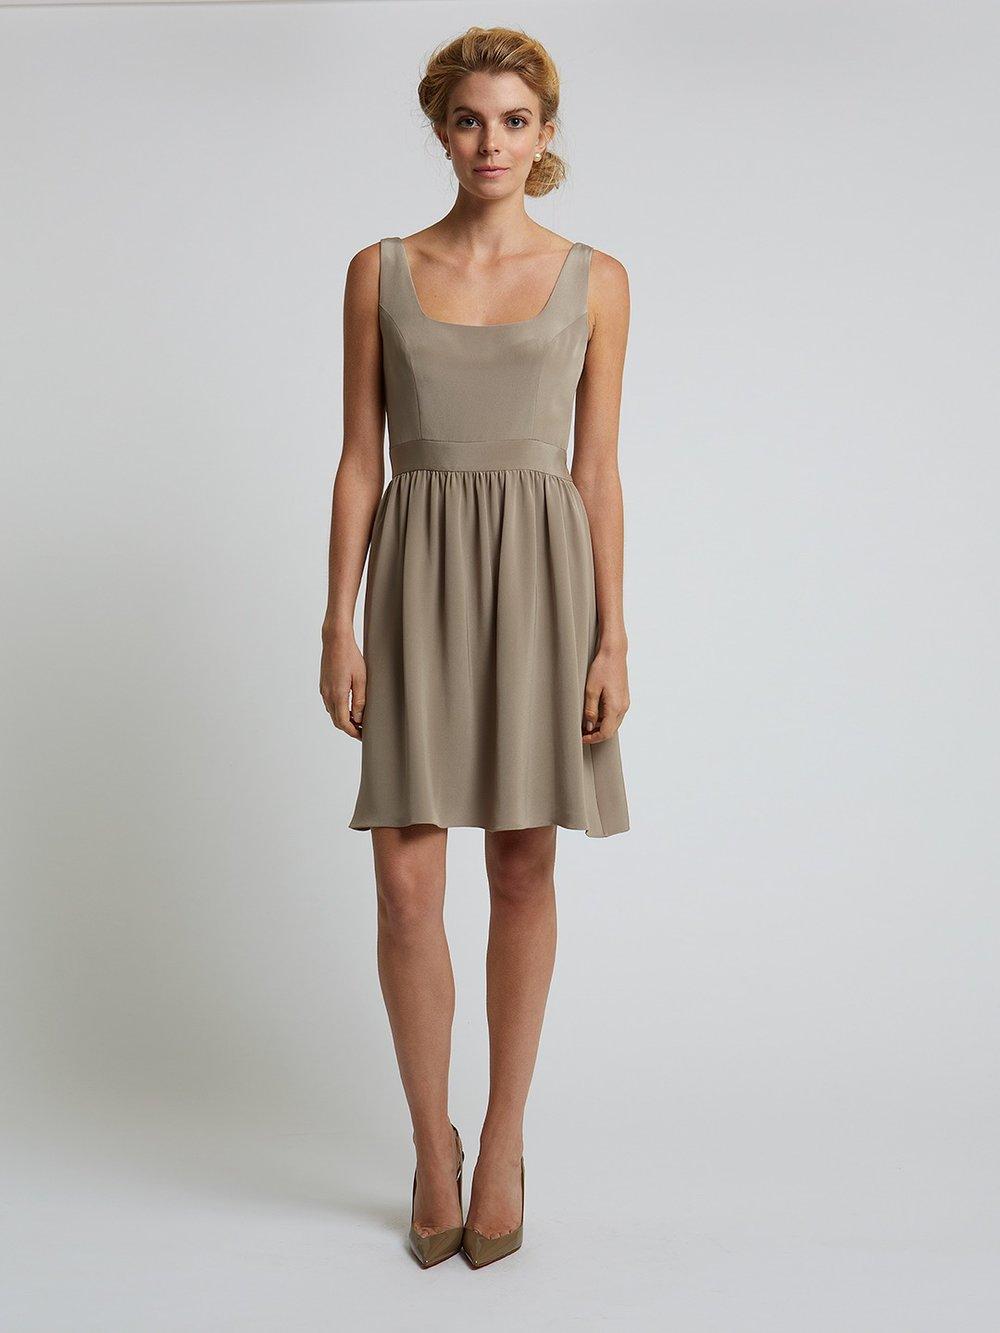 DELANEY DRESS.jpg